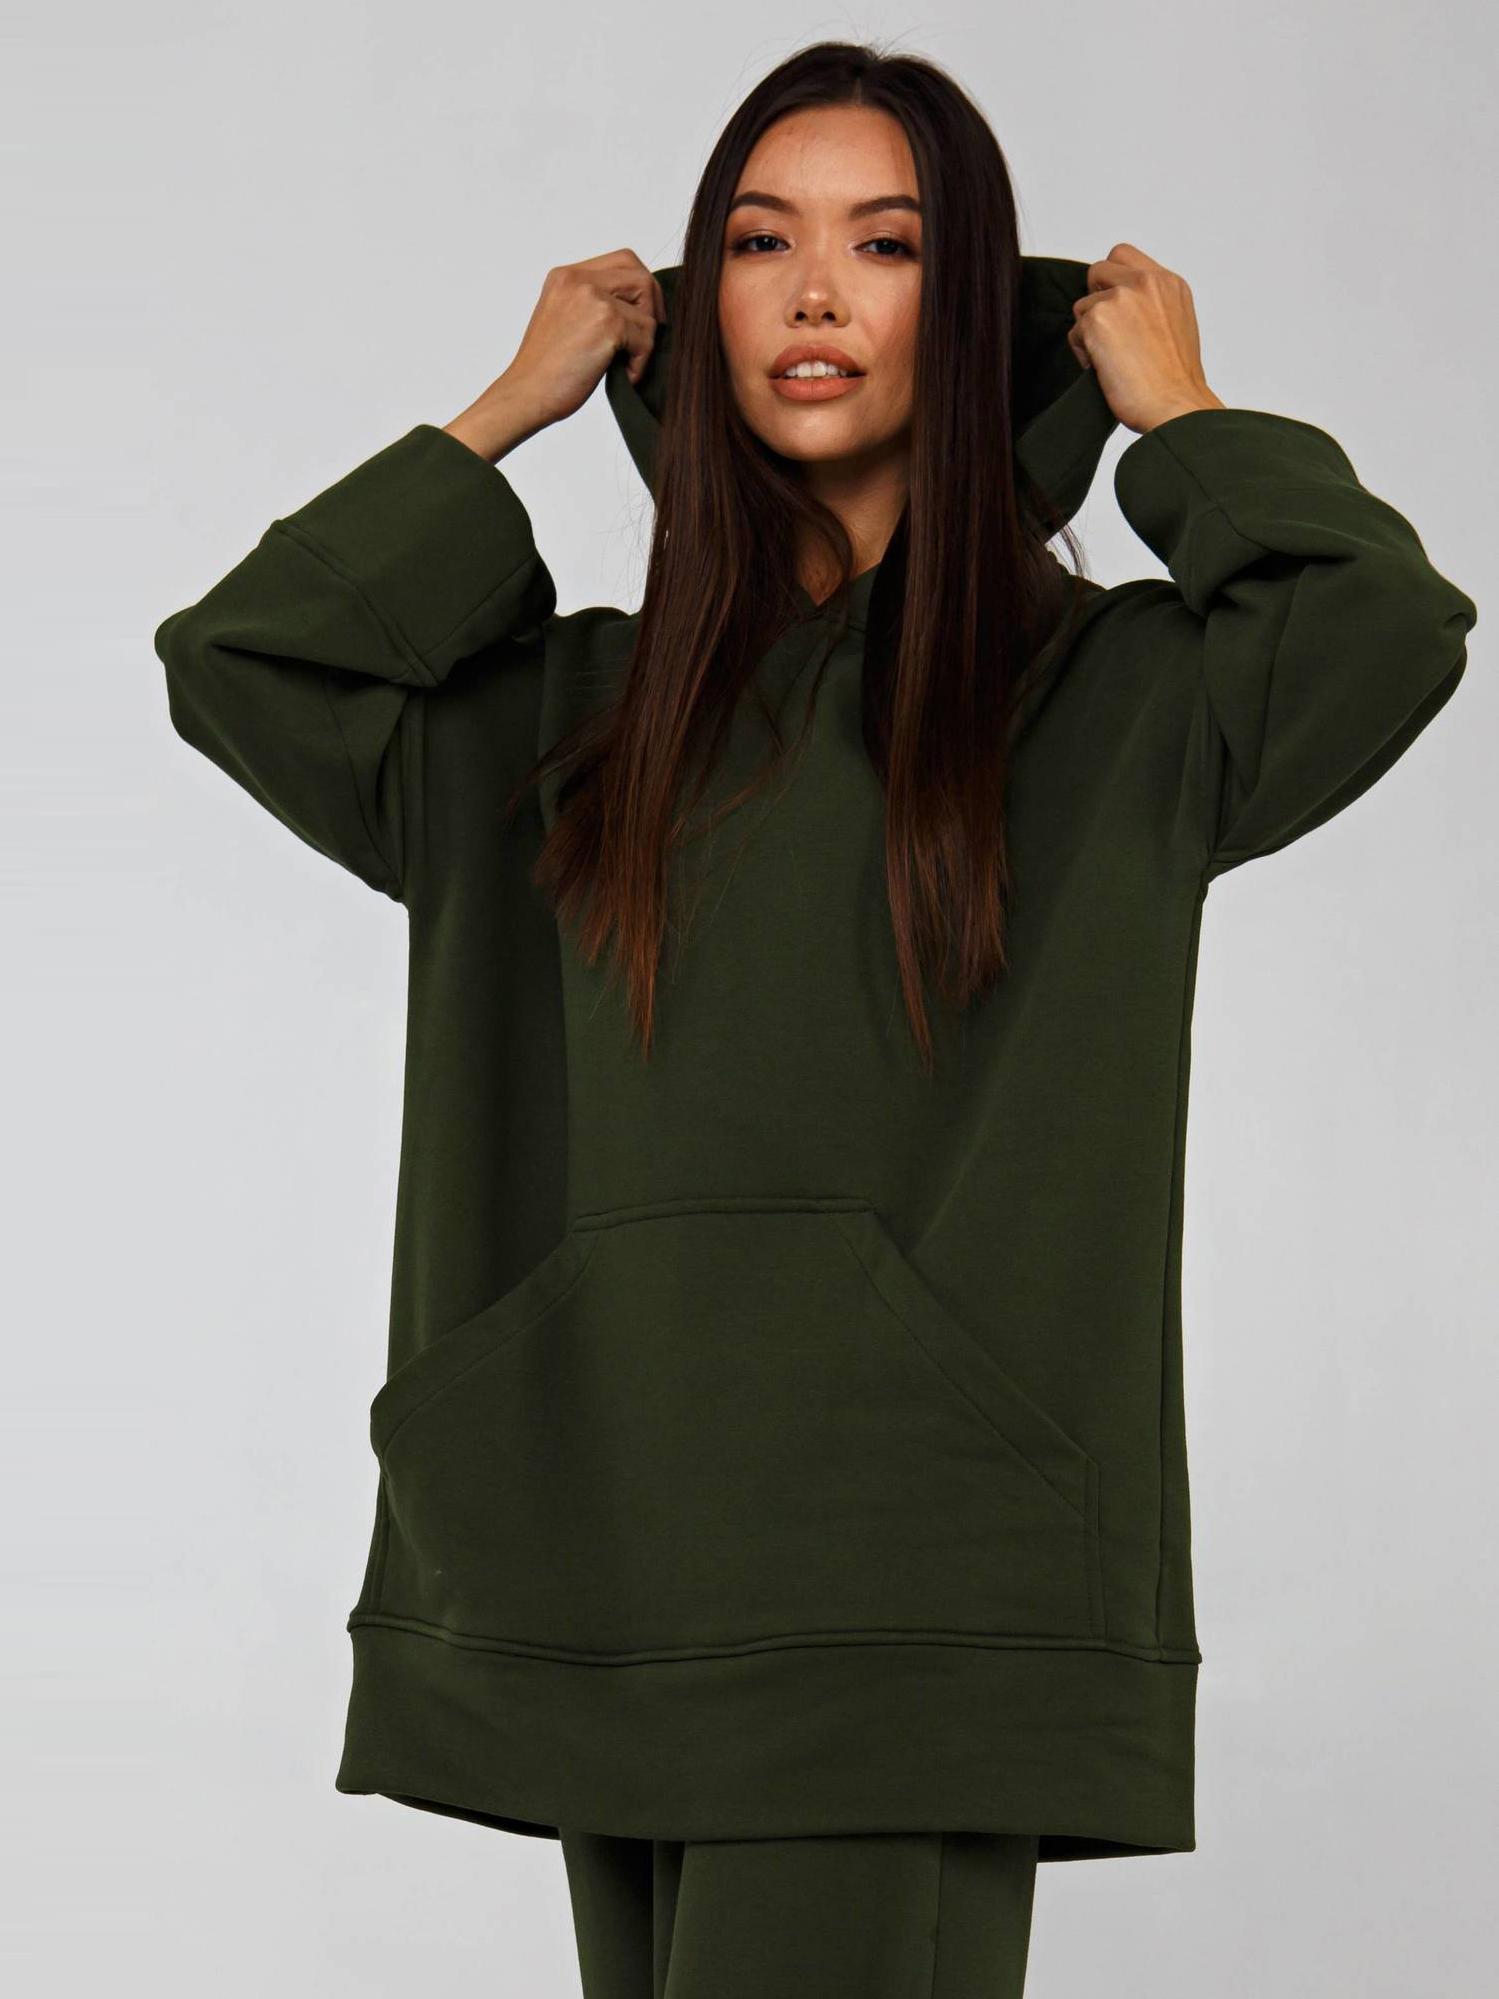 Худи трикотажное оливкового цвета YOS от украинского бренда Your Own Style